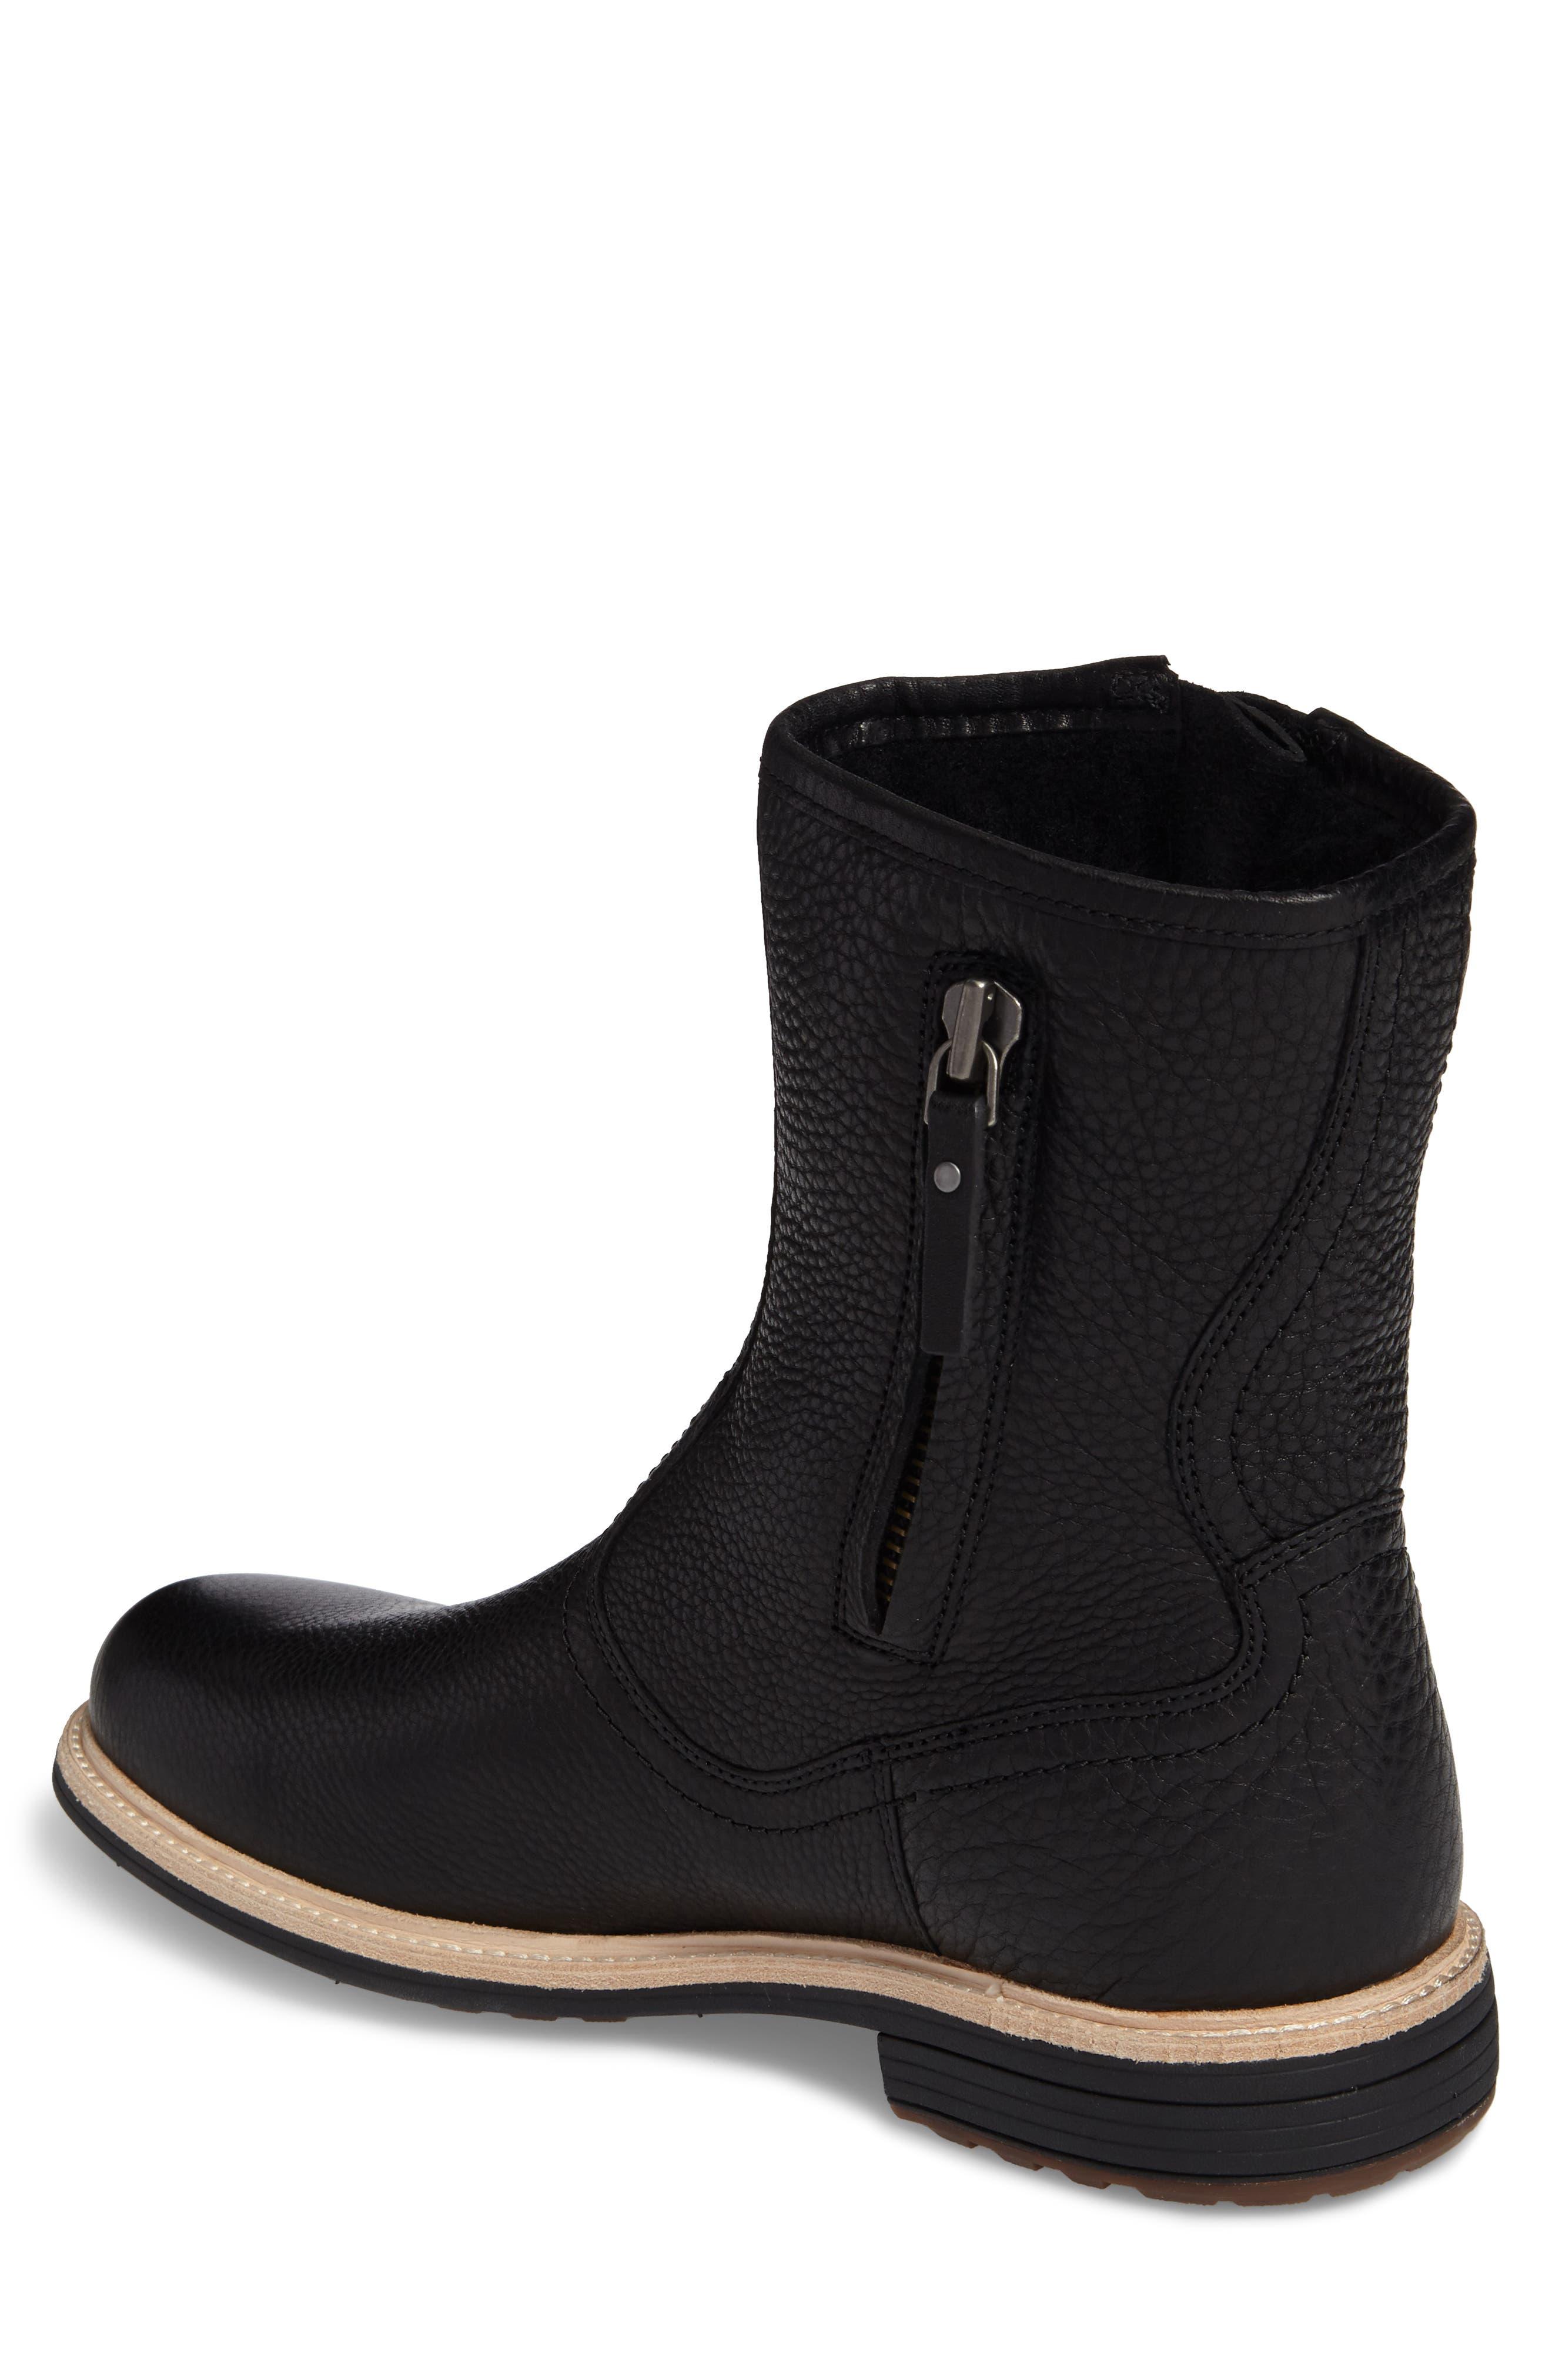 Jaren Zip Boot with Genuine Shearling,                             Alternate thumbnail 2, color,                             Black